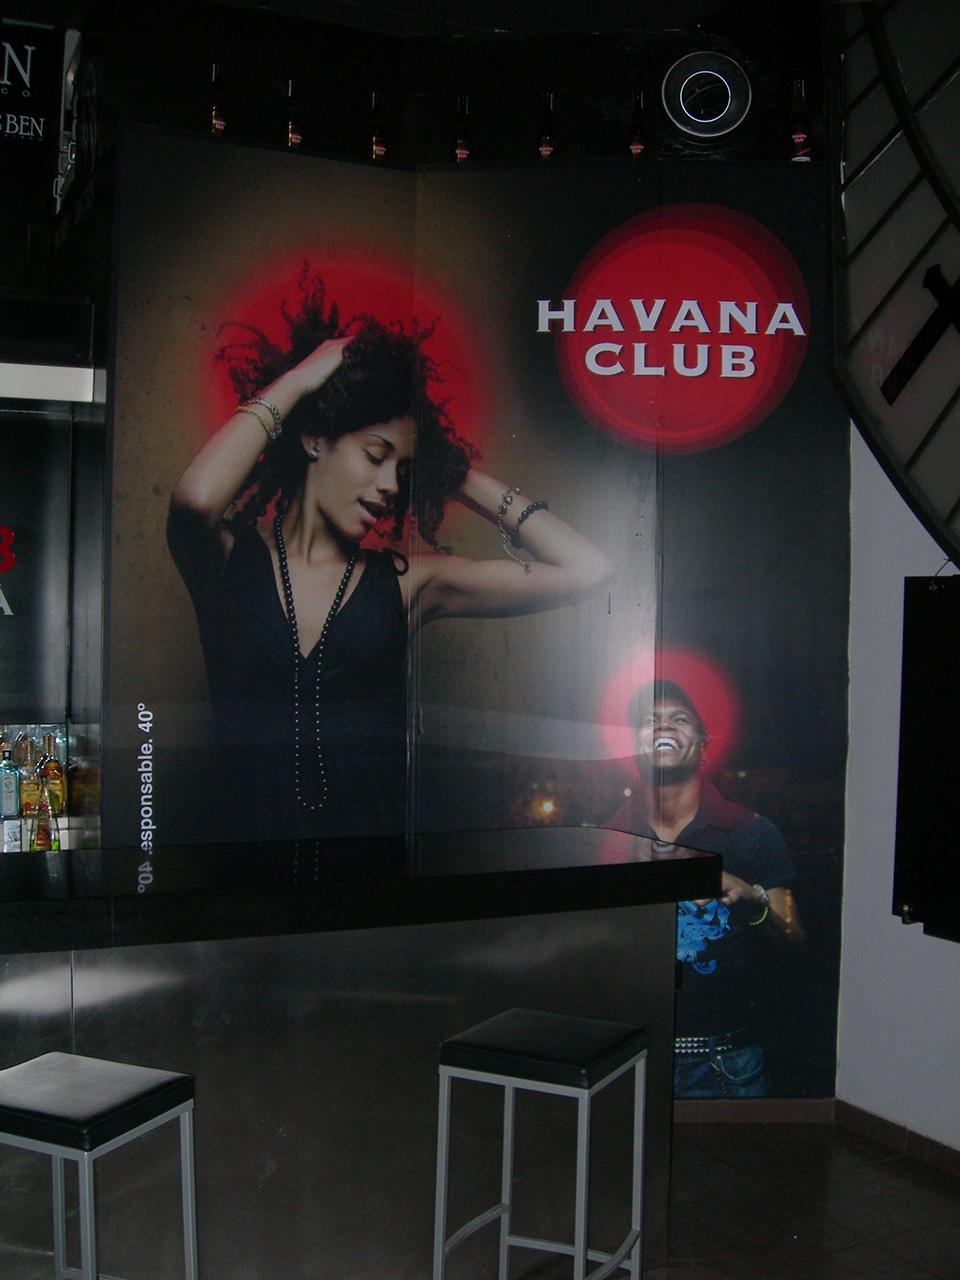 Ambietación Habana Club, Tenerife